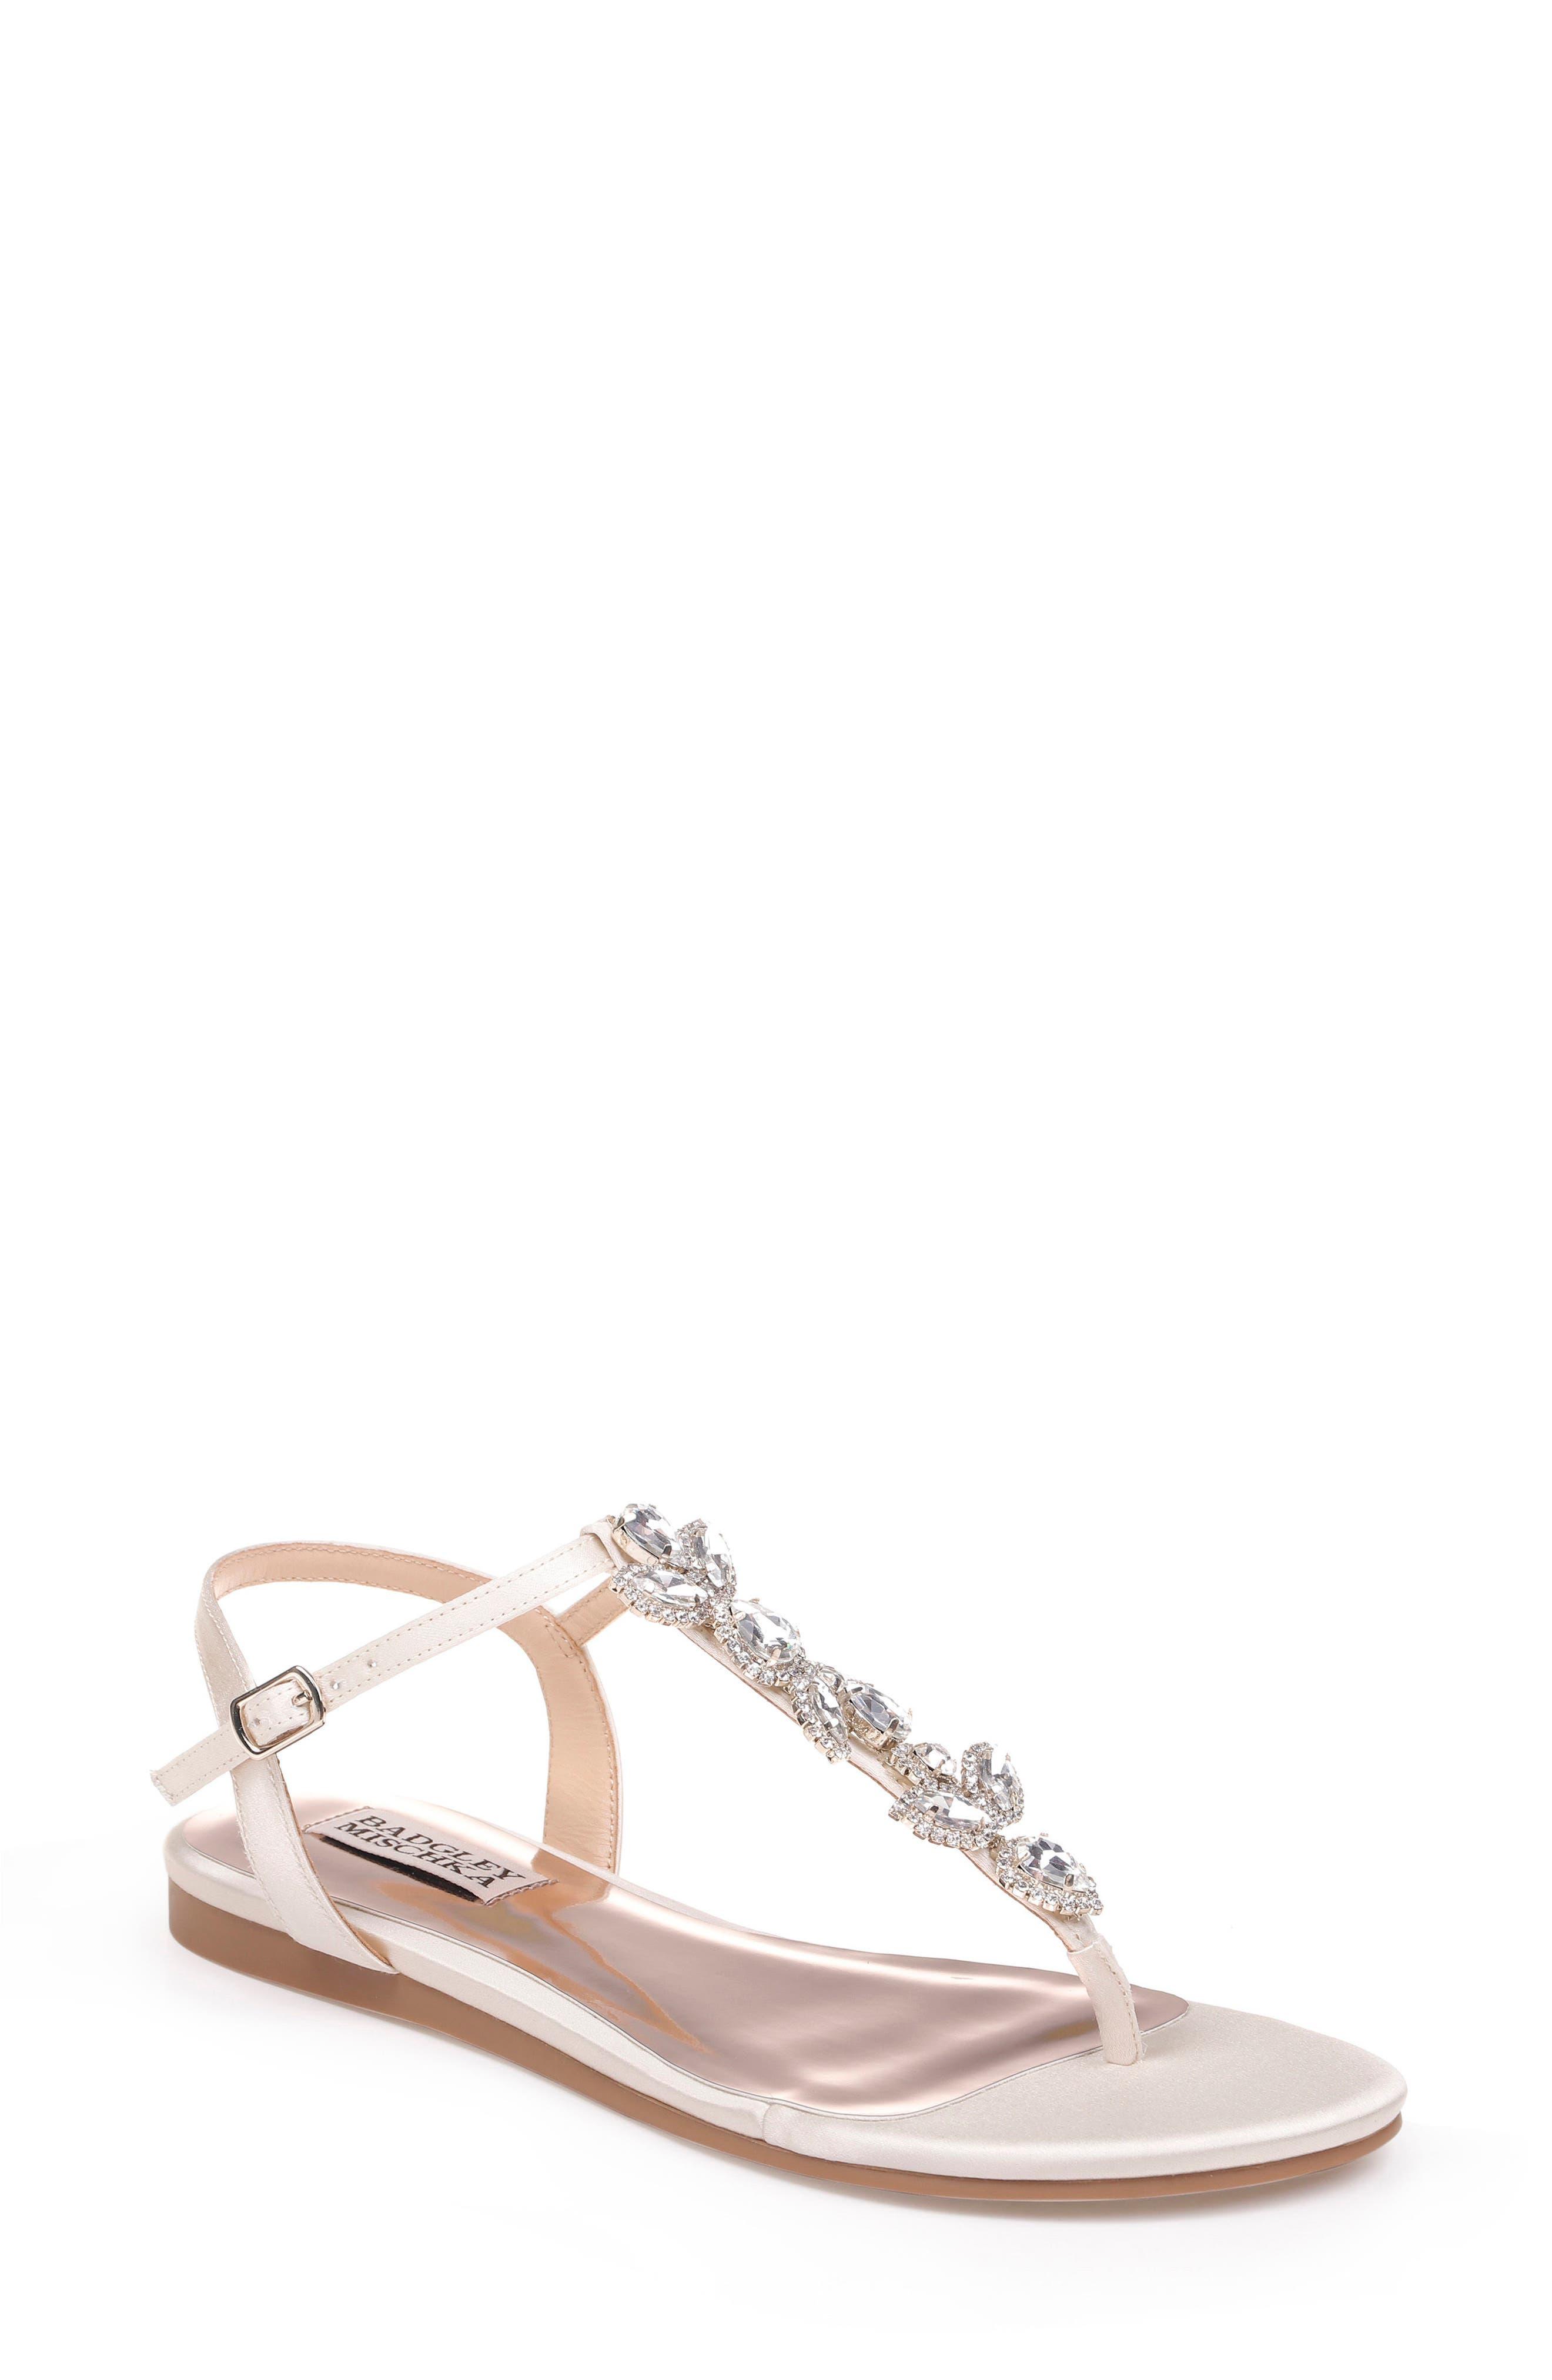 Sissi Crystal Embellished Sandal,                             Main thumbnail 1, color,                             Ivory Satin